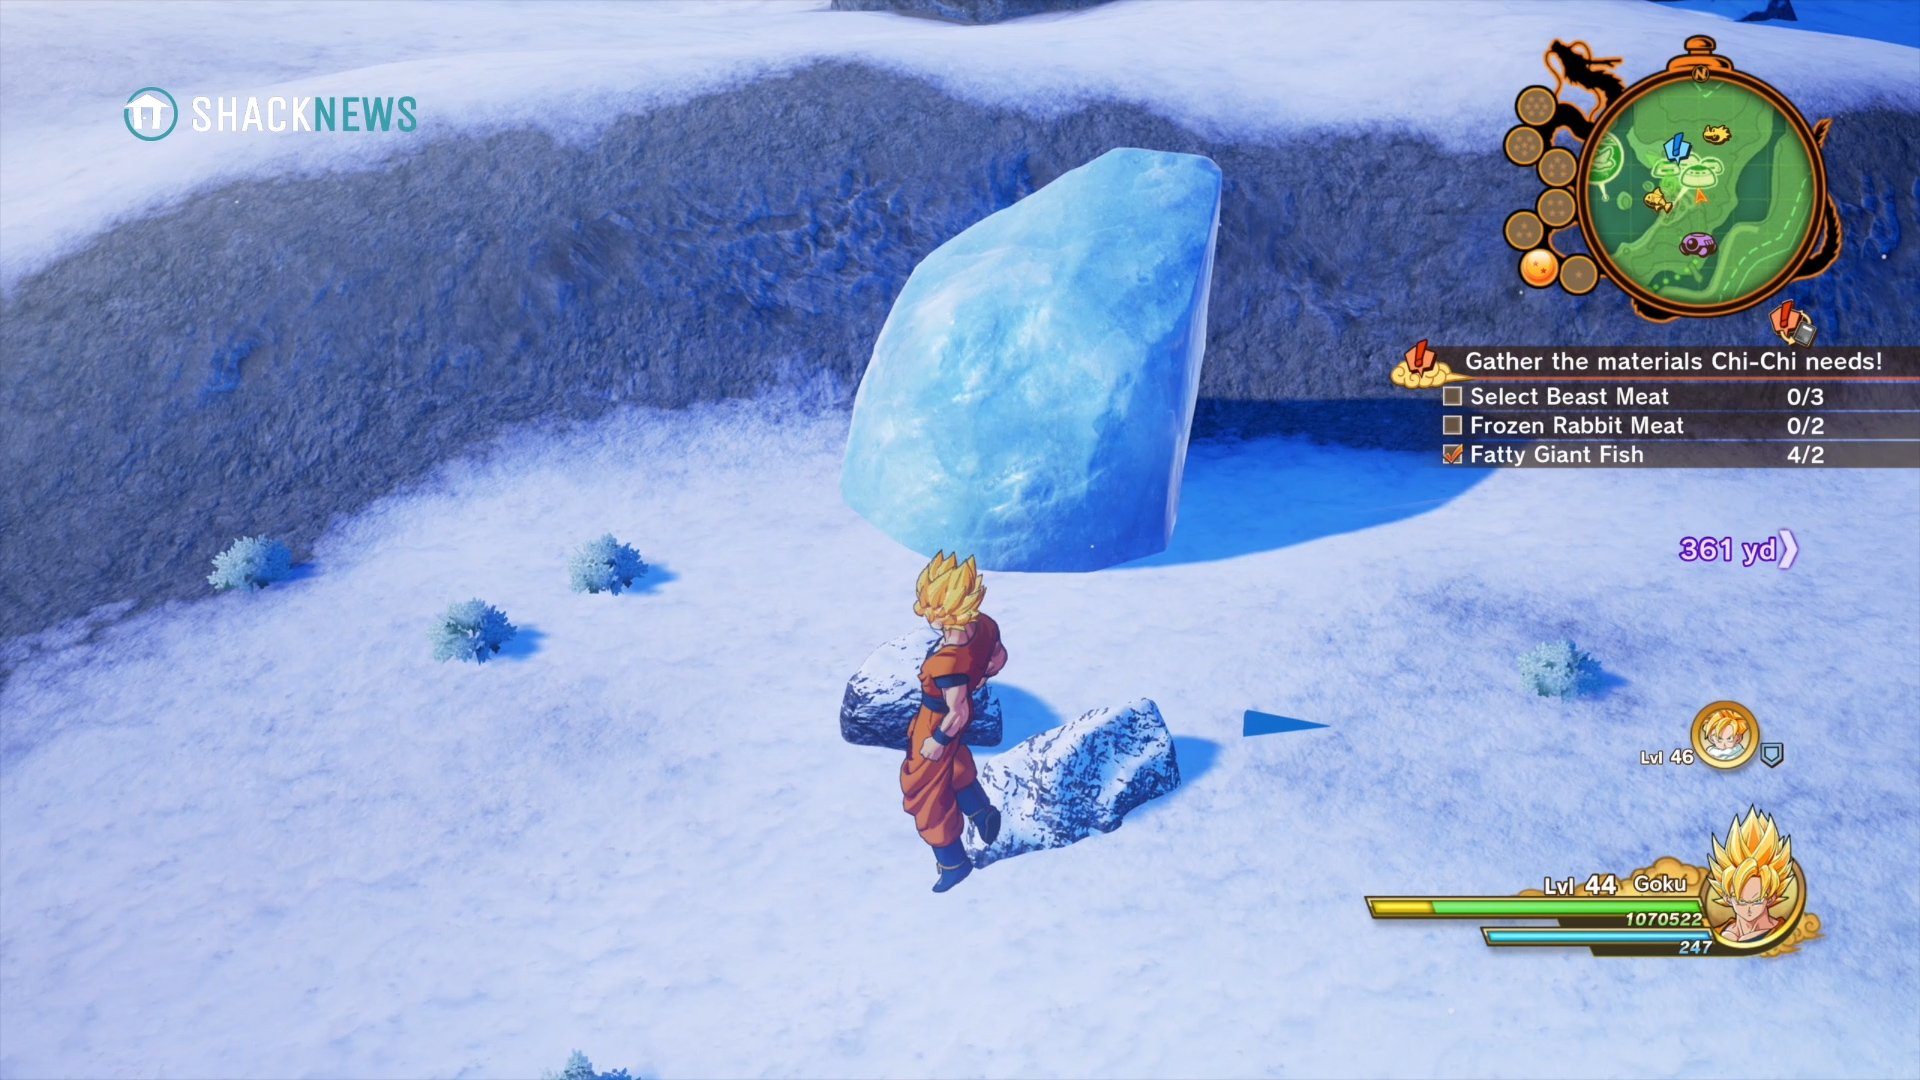 Dragon Ball Z: Kakarot - Frozen Rabbit Meat locations